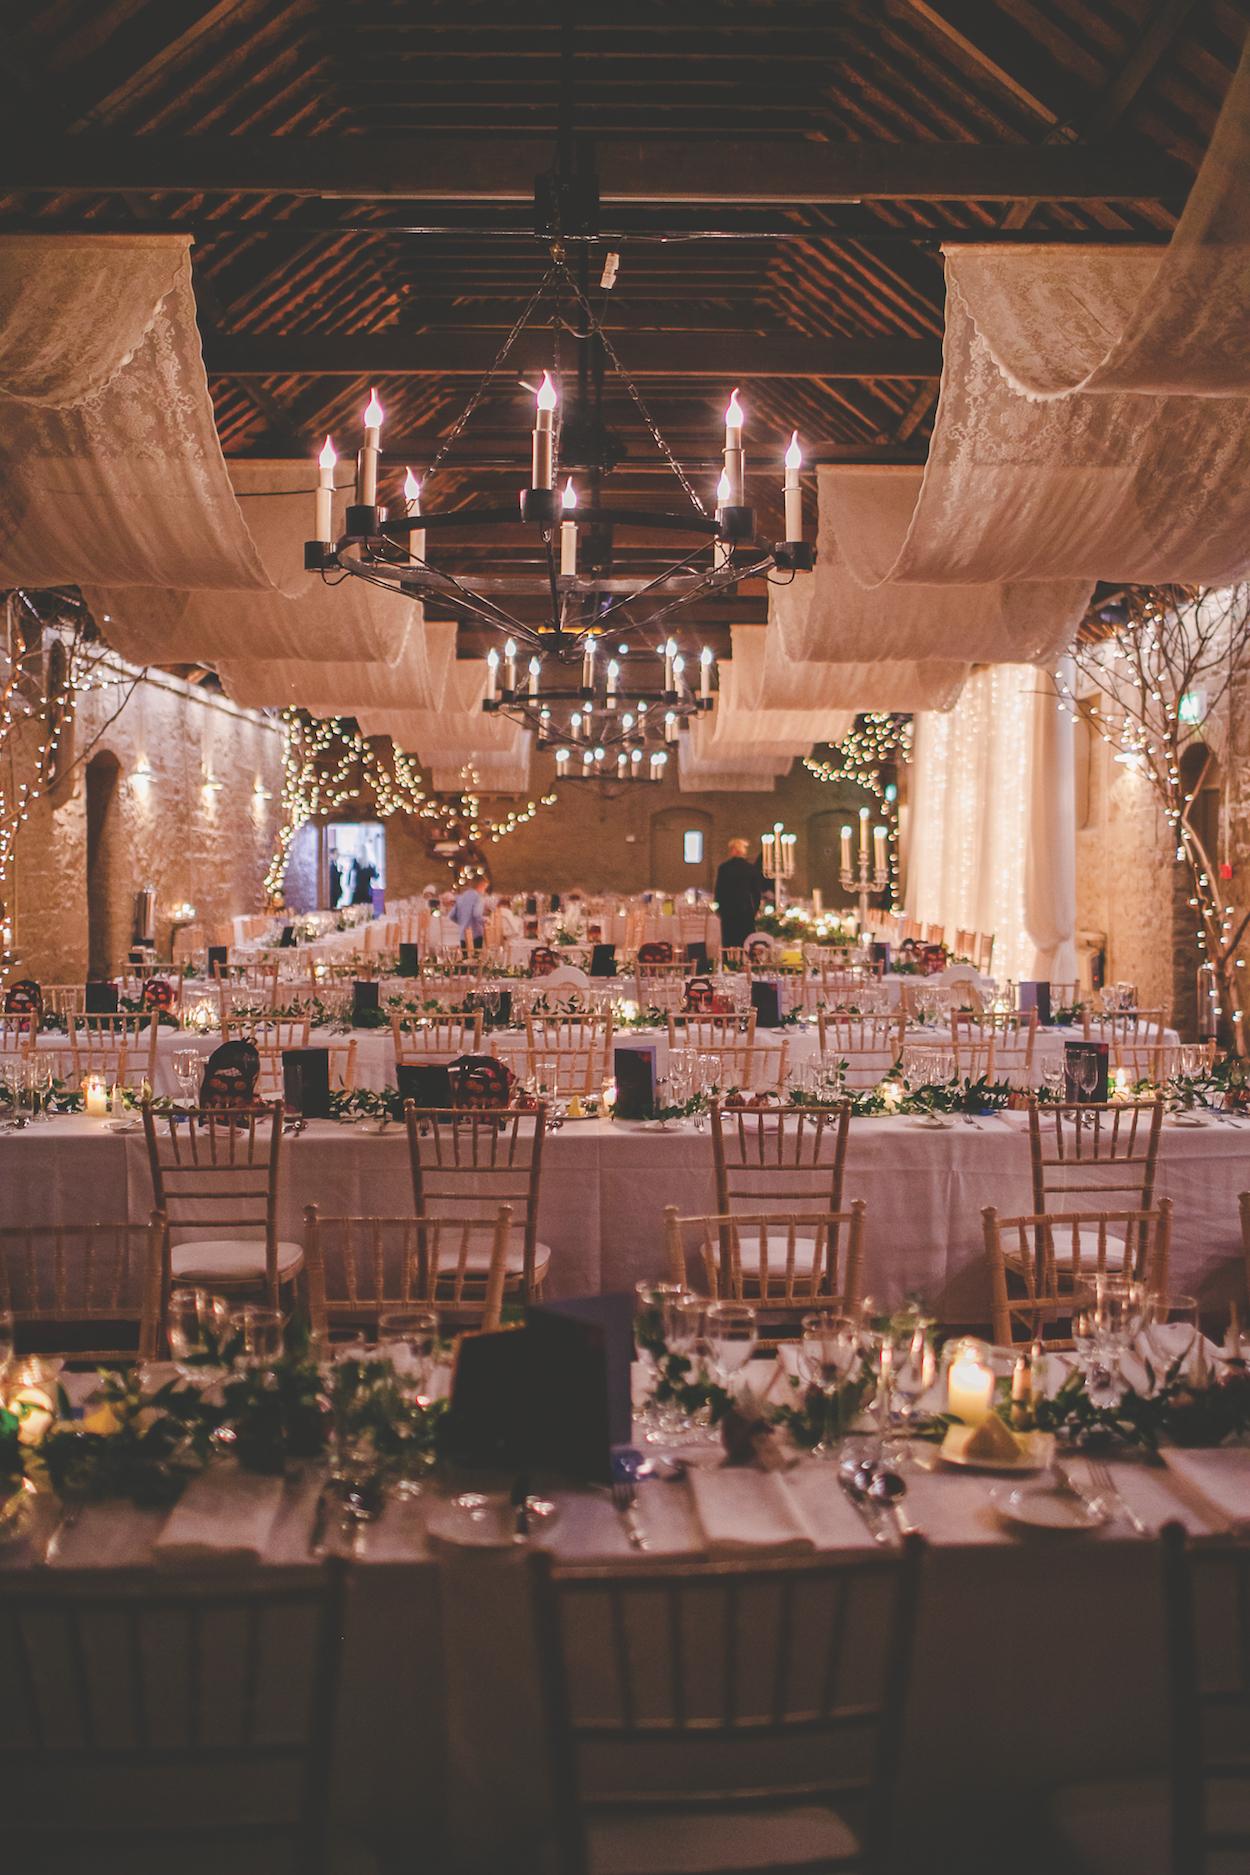 gather_and_tides_wedding_photographer_larchfield_autumn_northern_ireland_Wedding_inspire_Weddings_3.jpeg